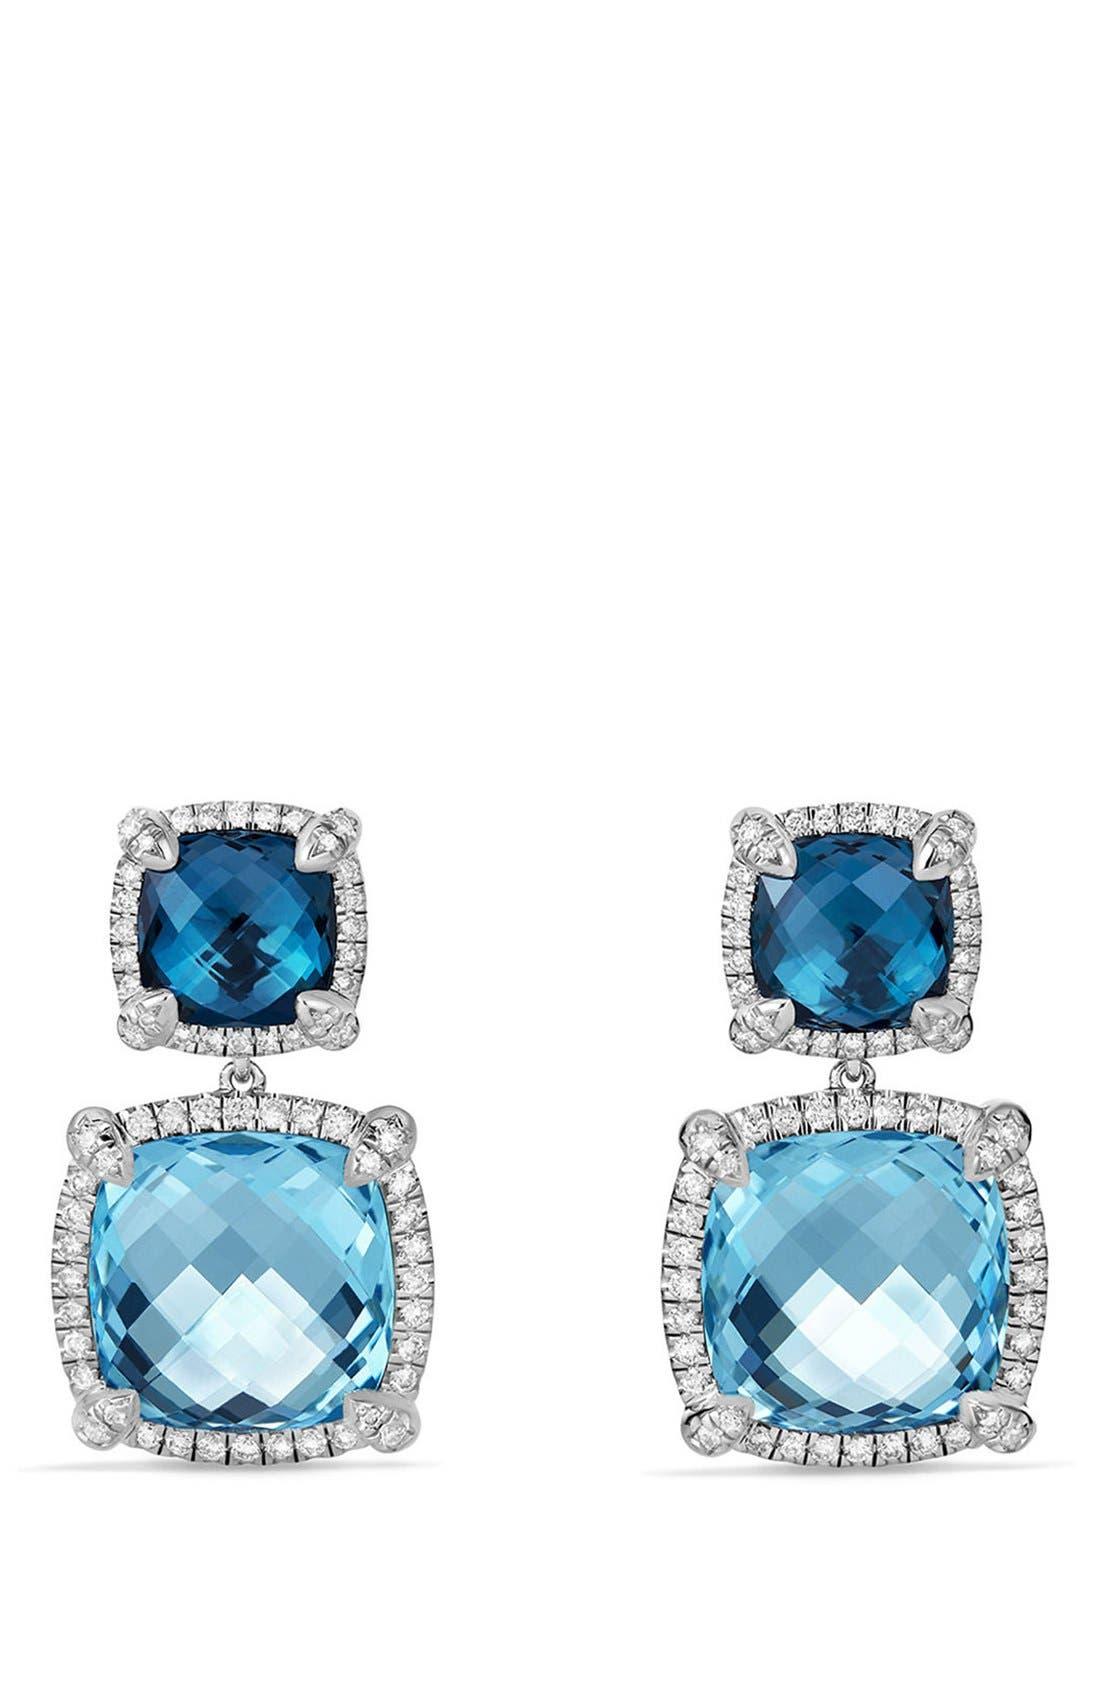 Alternate Image 1 Selected - David Yurman 'Châtelaine' Pavé Bezel Double Drop Earrings with Diamonds